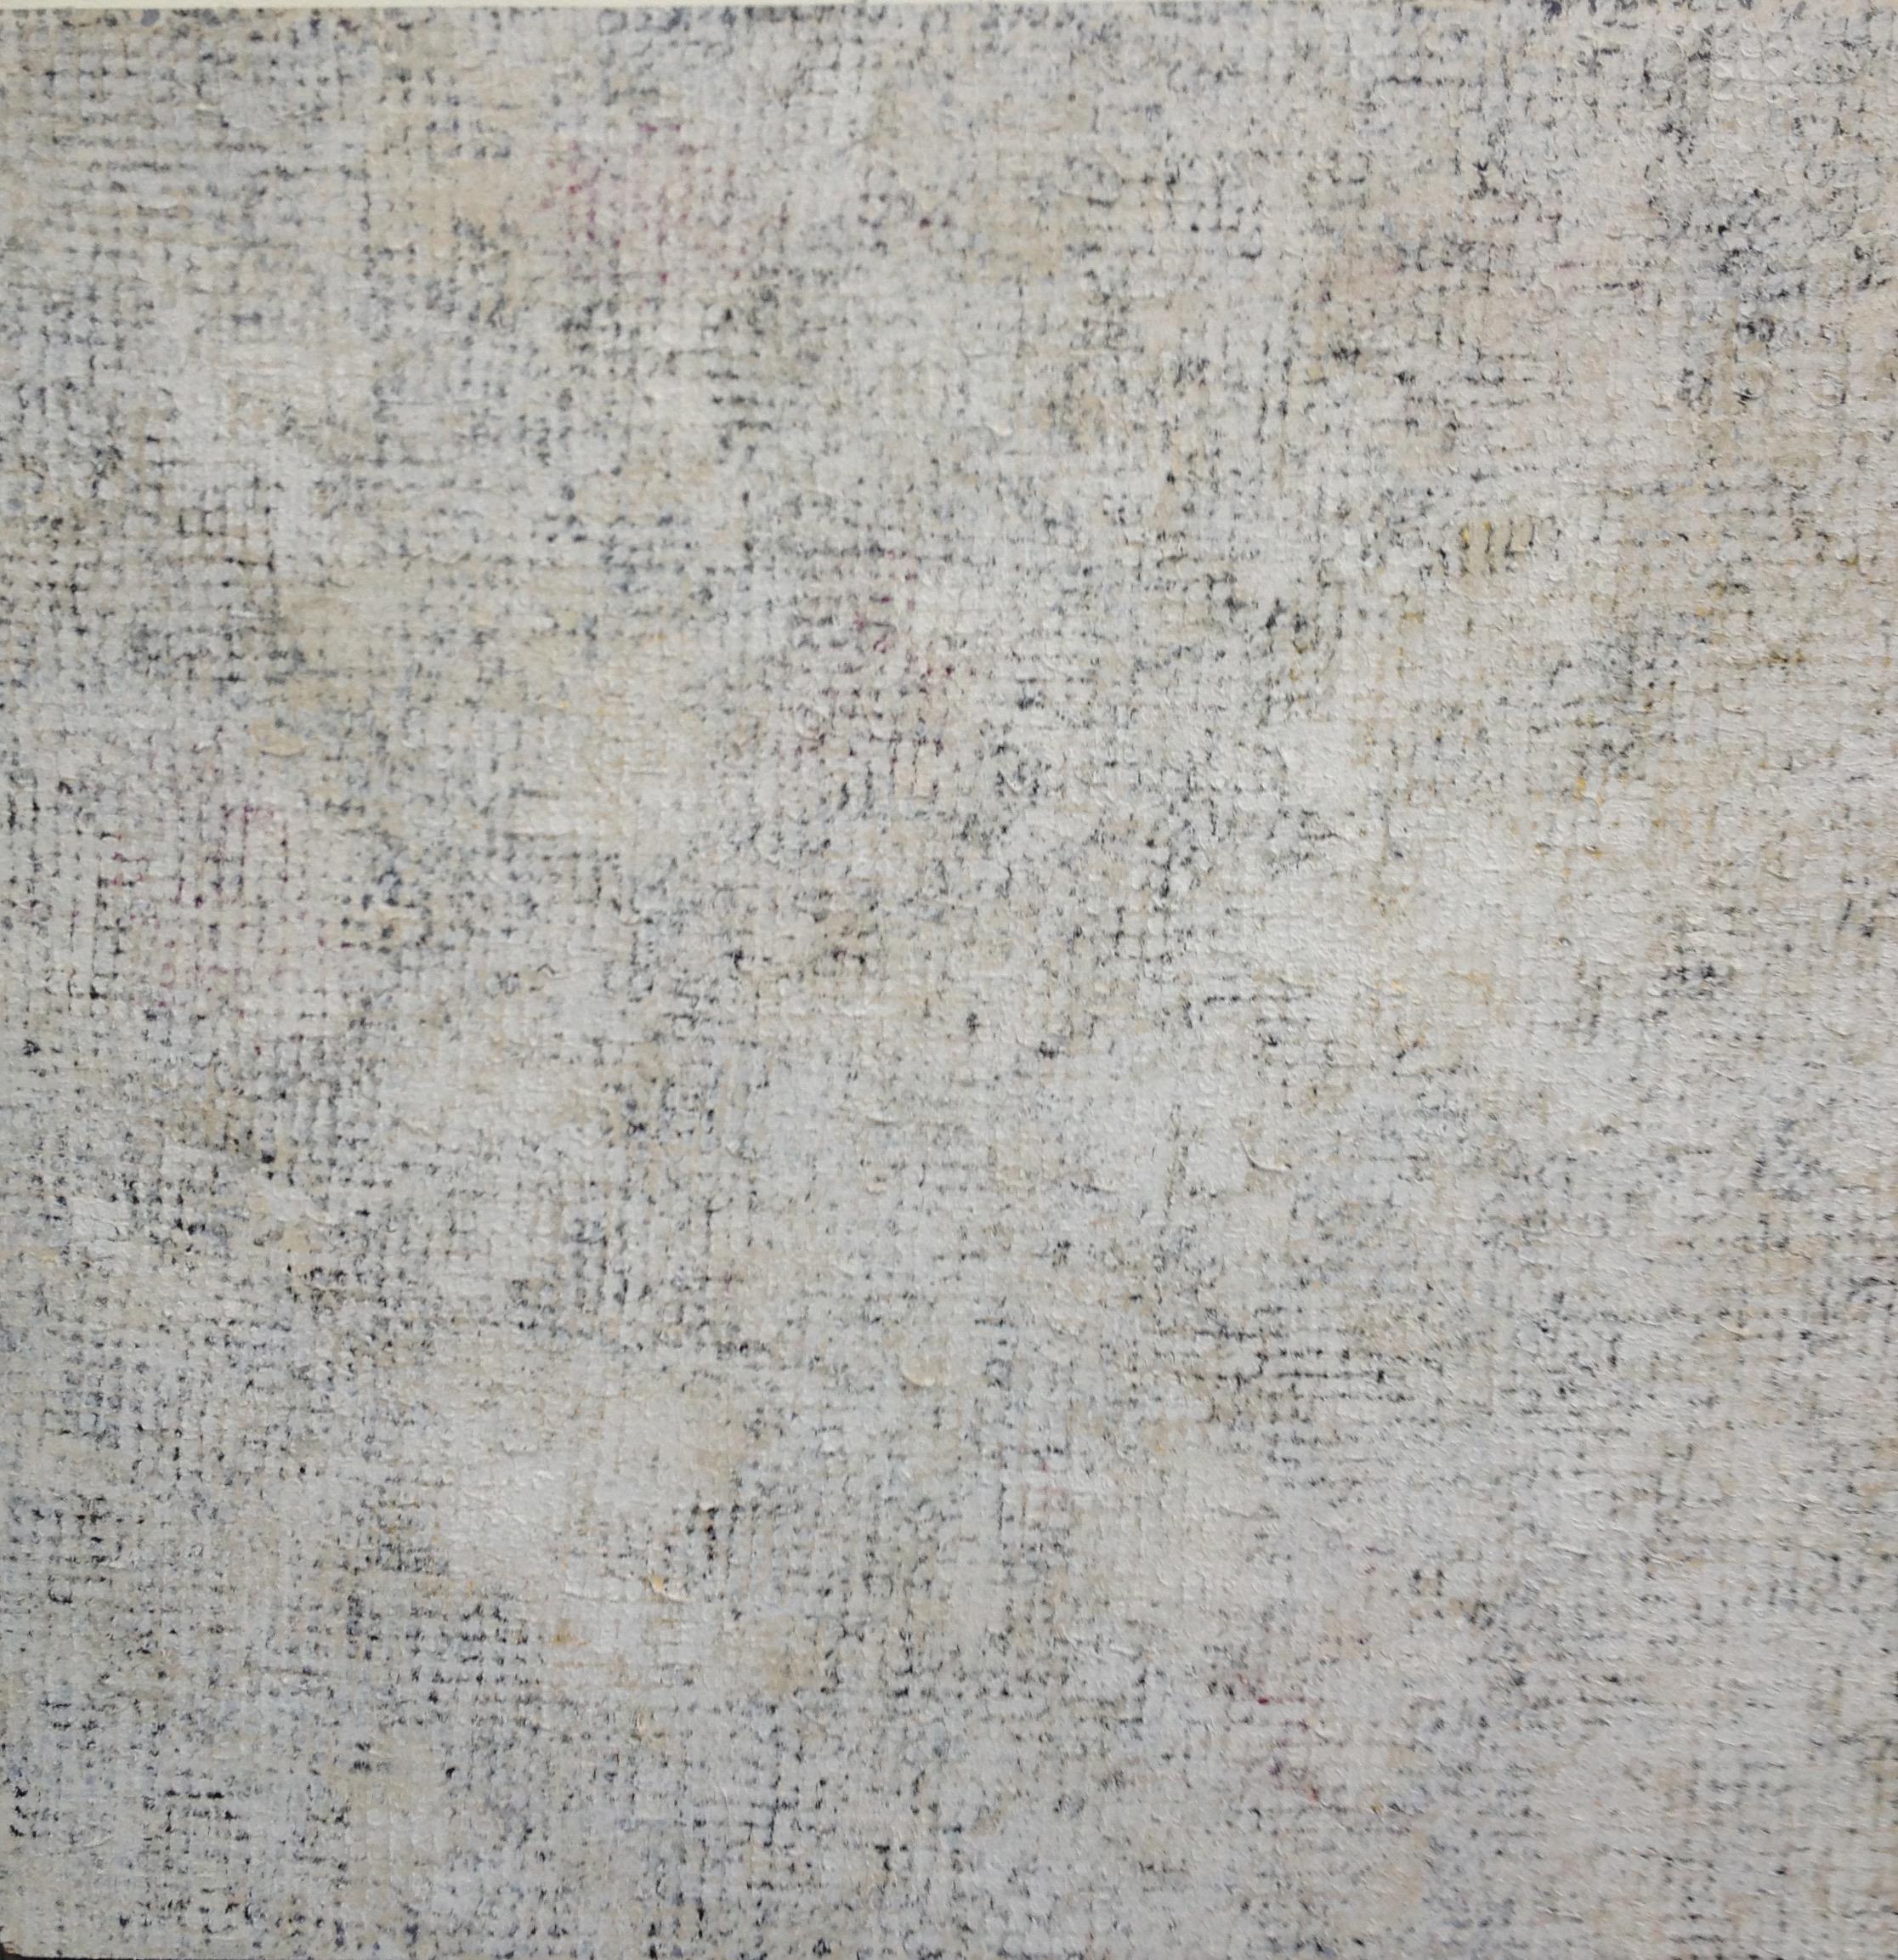 Rug Padding, Acrylic on Wood panel, 2014